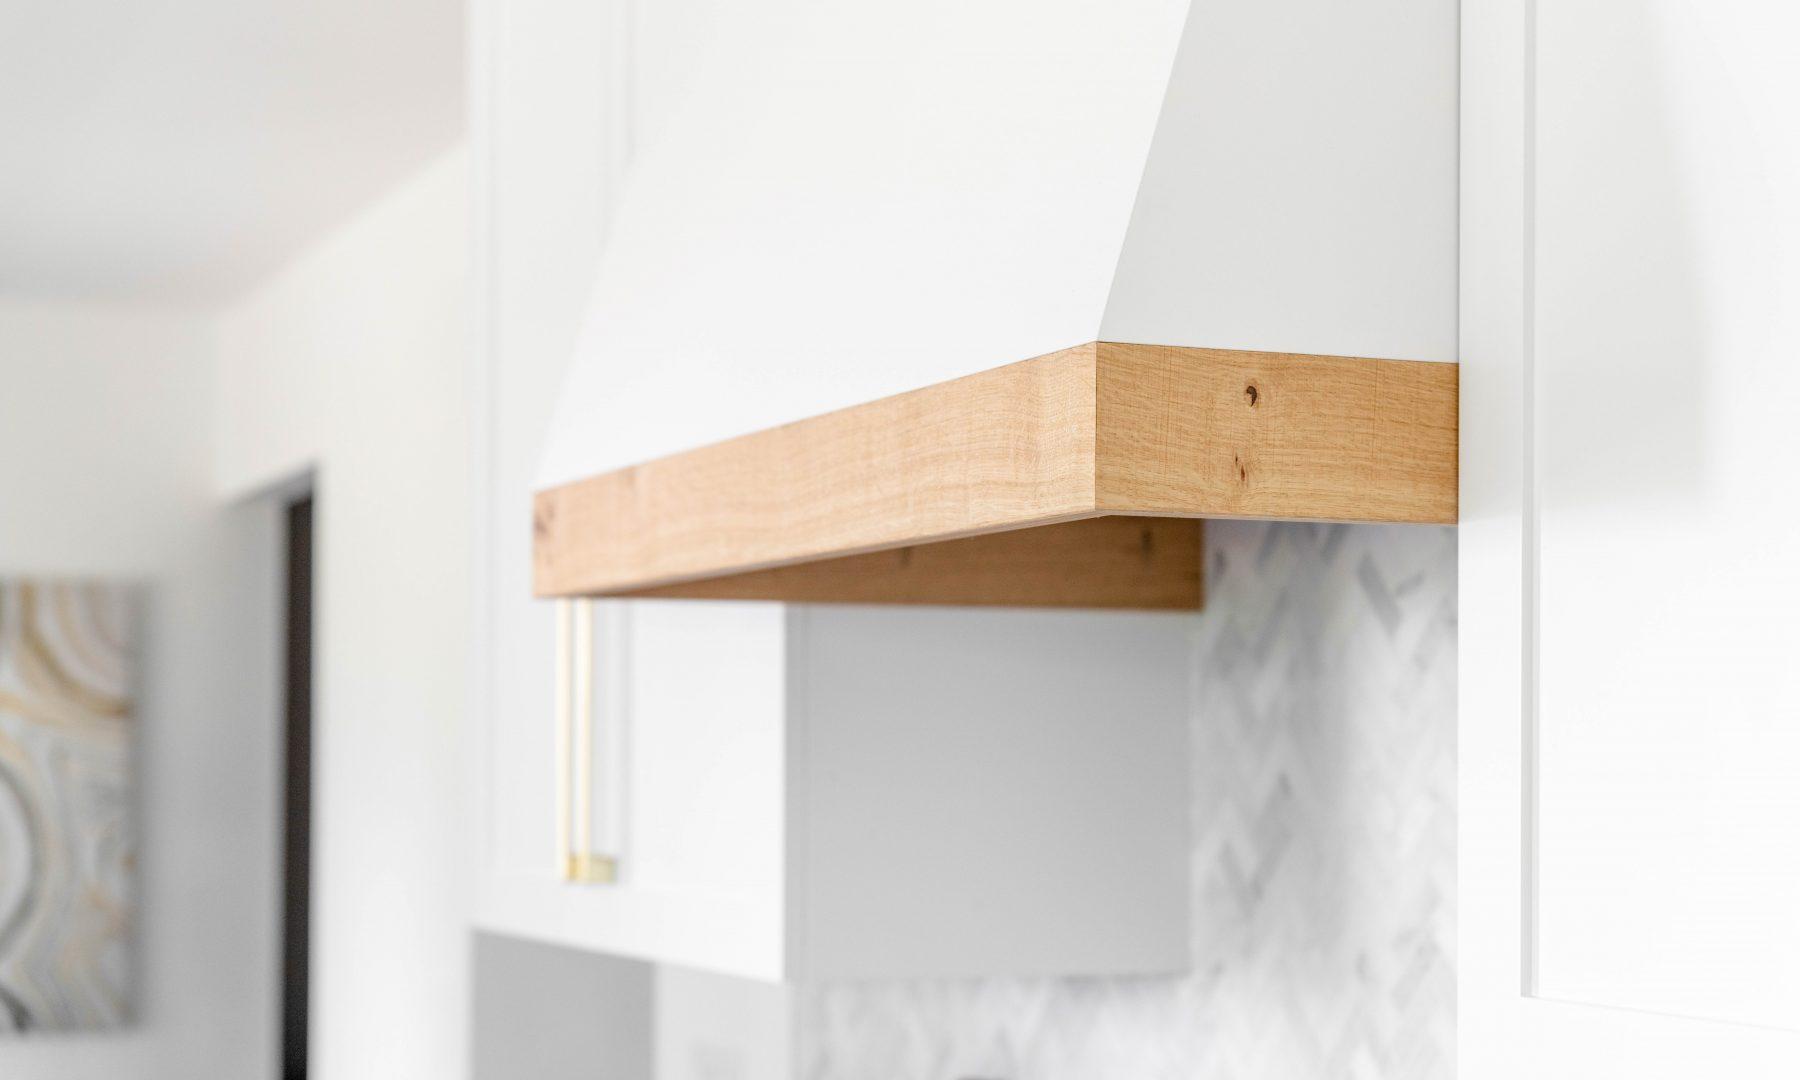 Cabico Custom Cabinets - Royal Oak Hood project - left side view